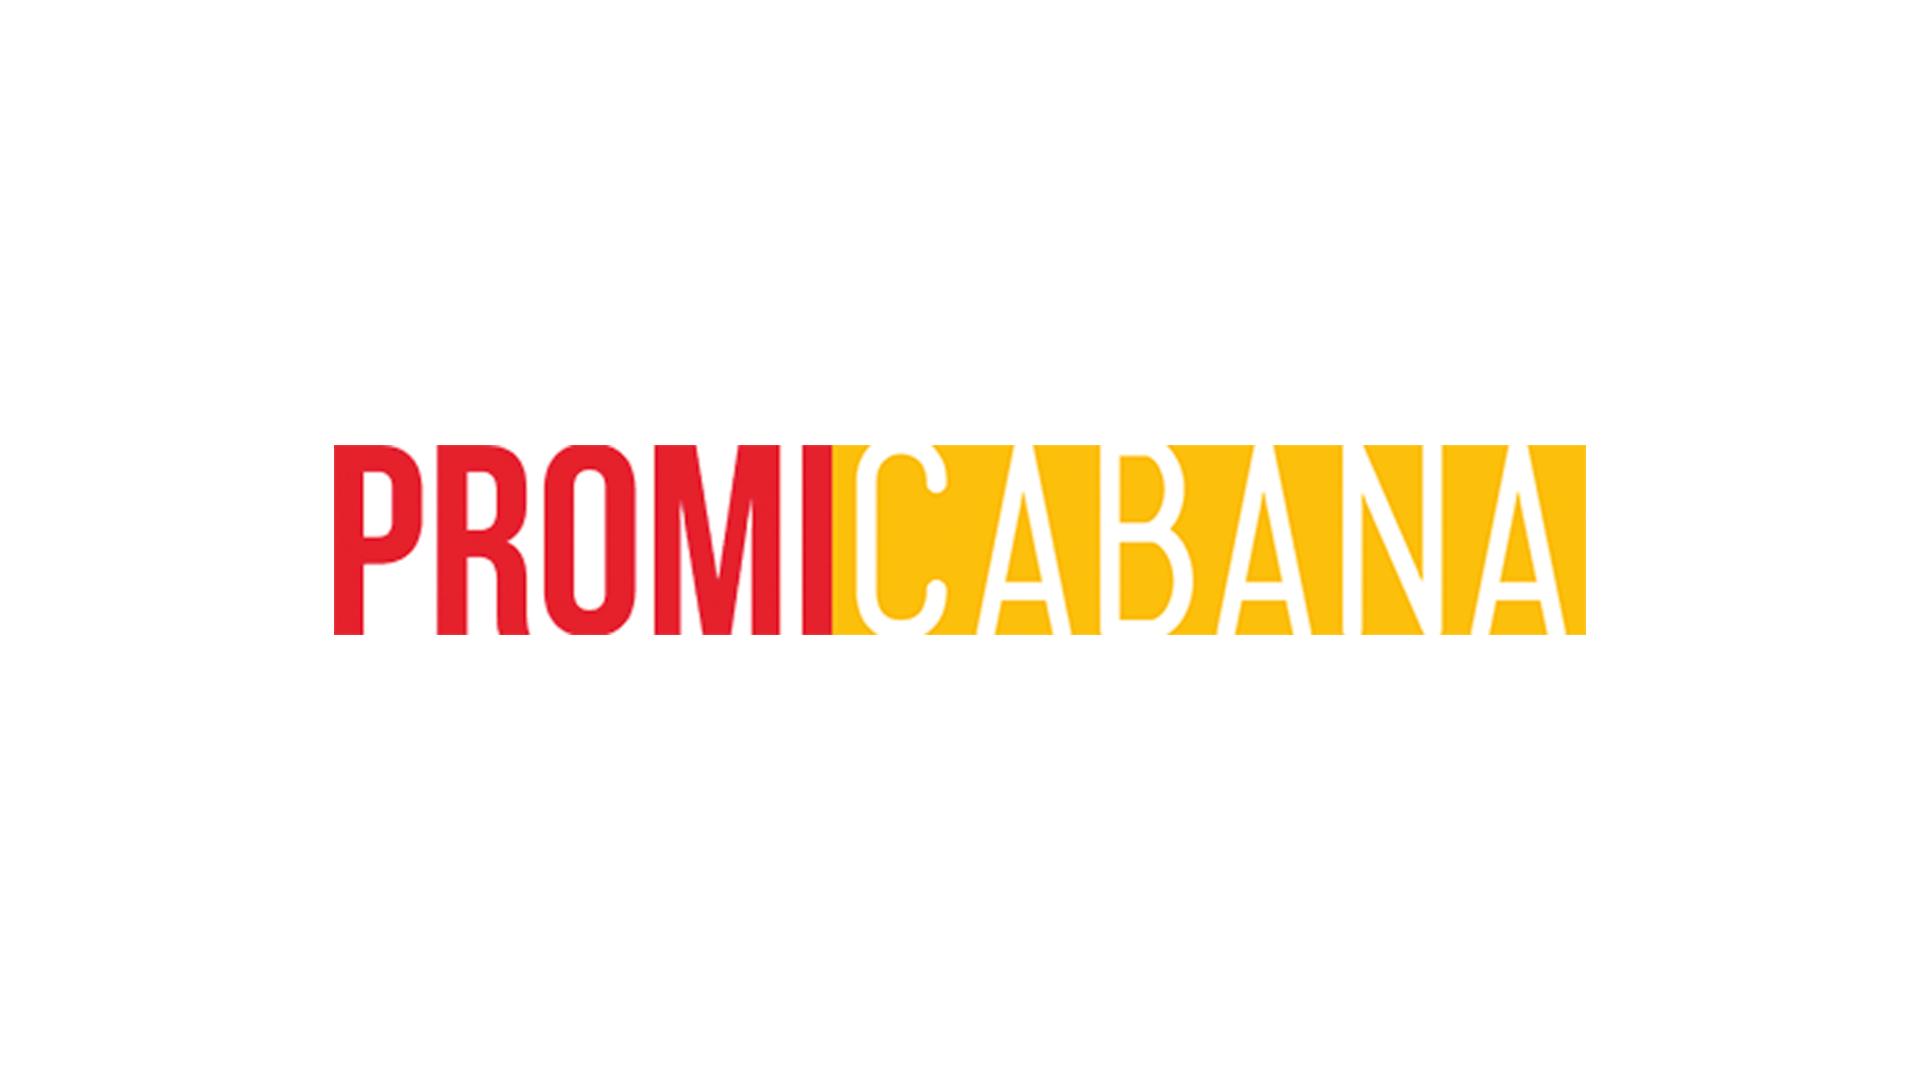 Charlie-Sheen-Jimmy-Kimmel-Juli-2012